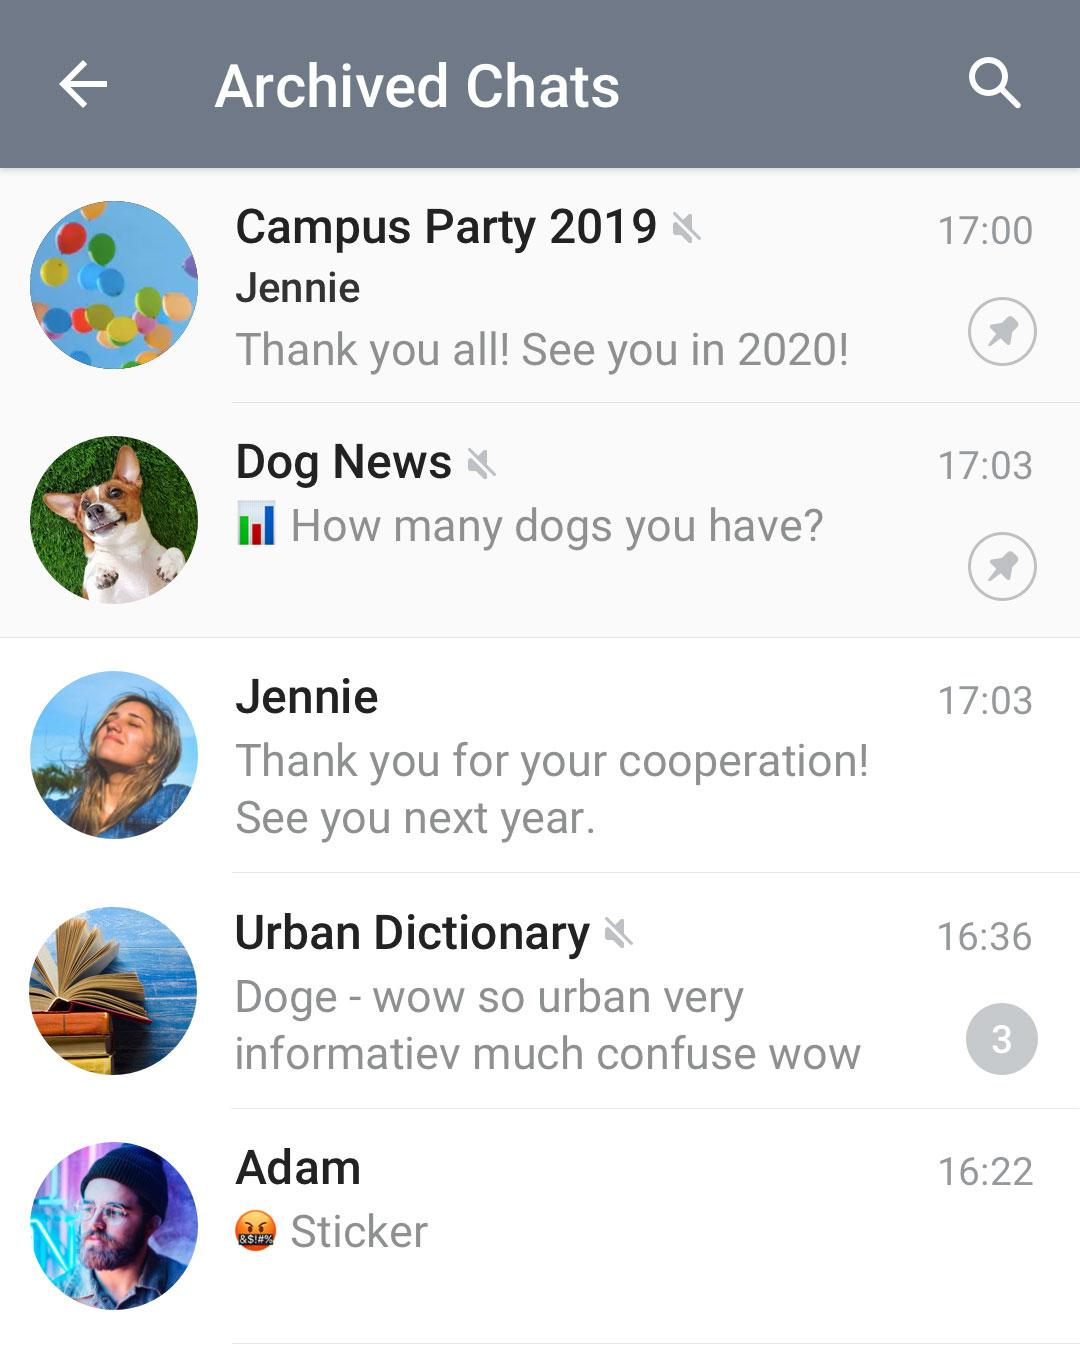 Telegram Update - آپدیت تلگرام ۵.۶ با قابلیت آرشیو پیام ها ارایه شد